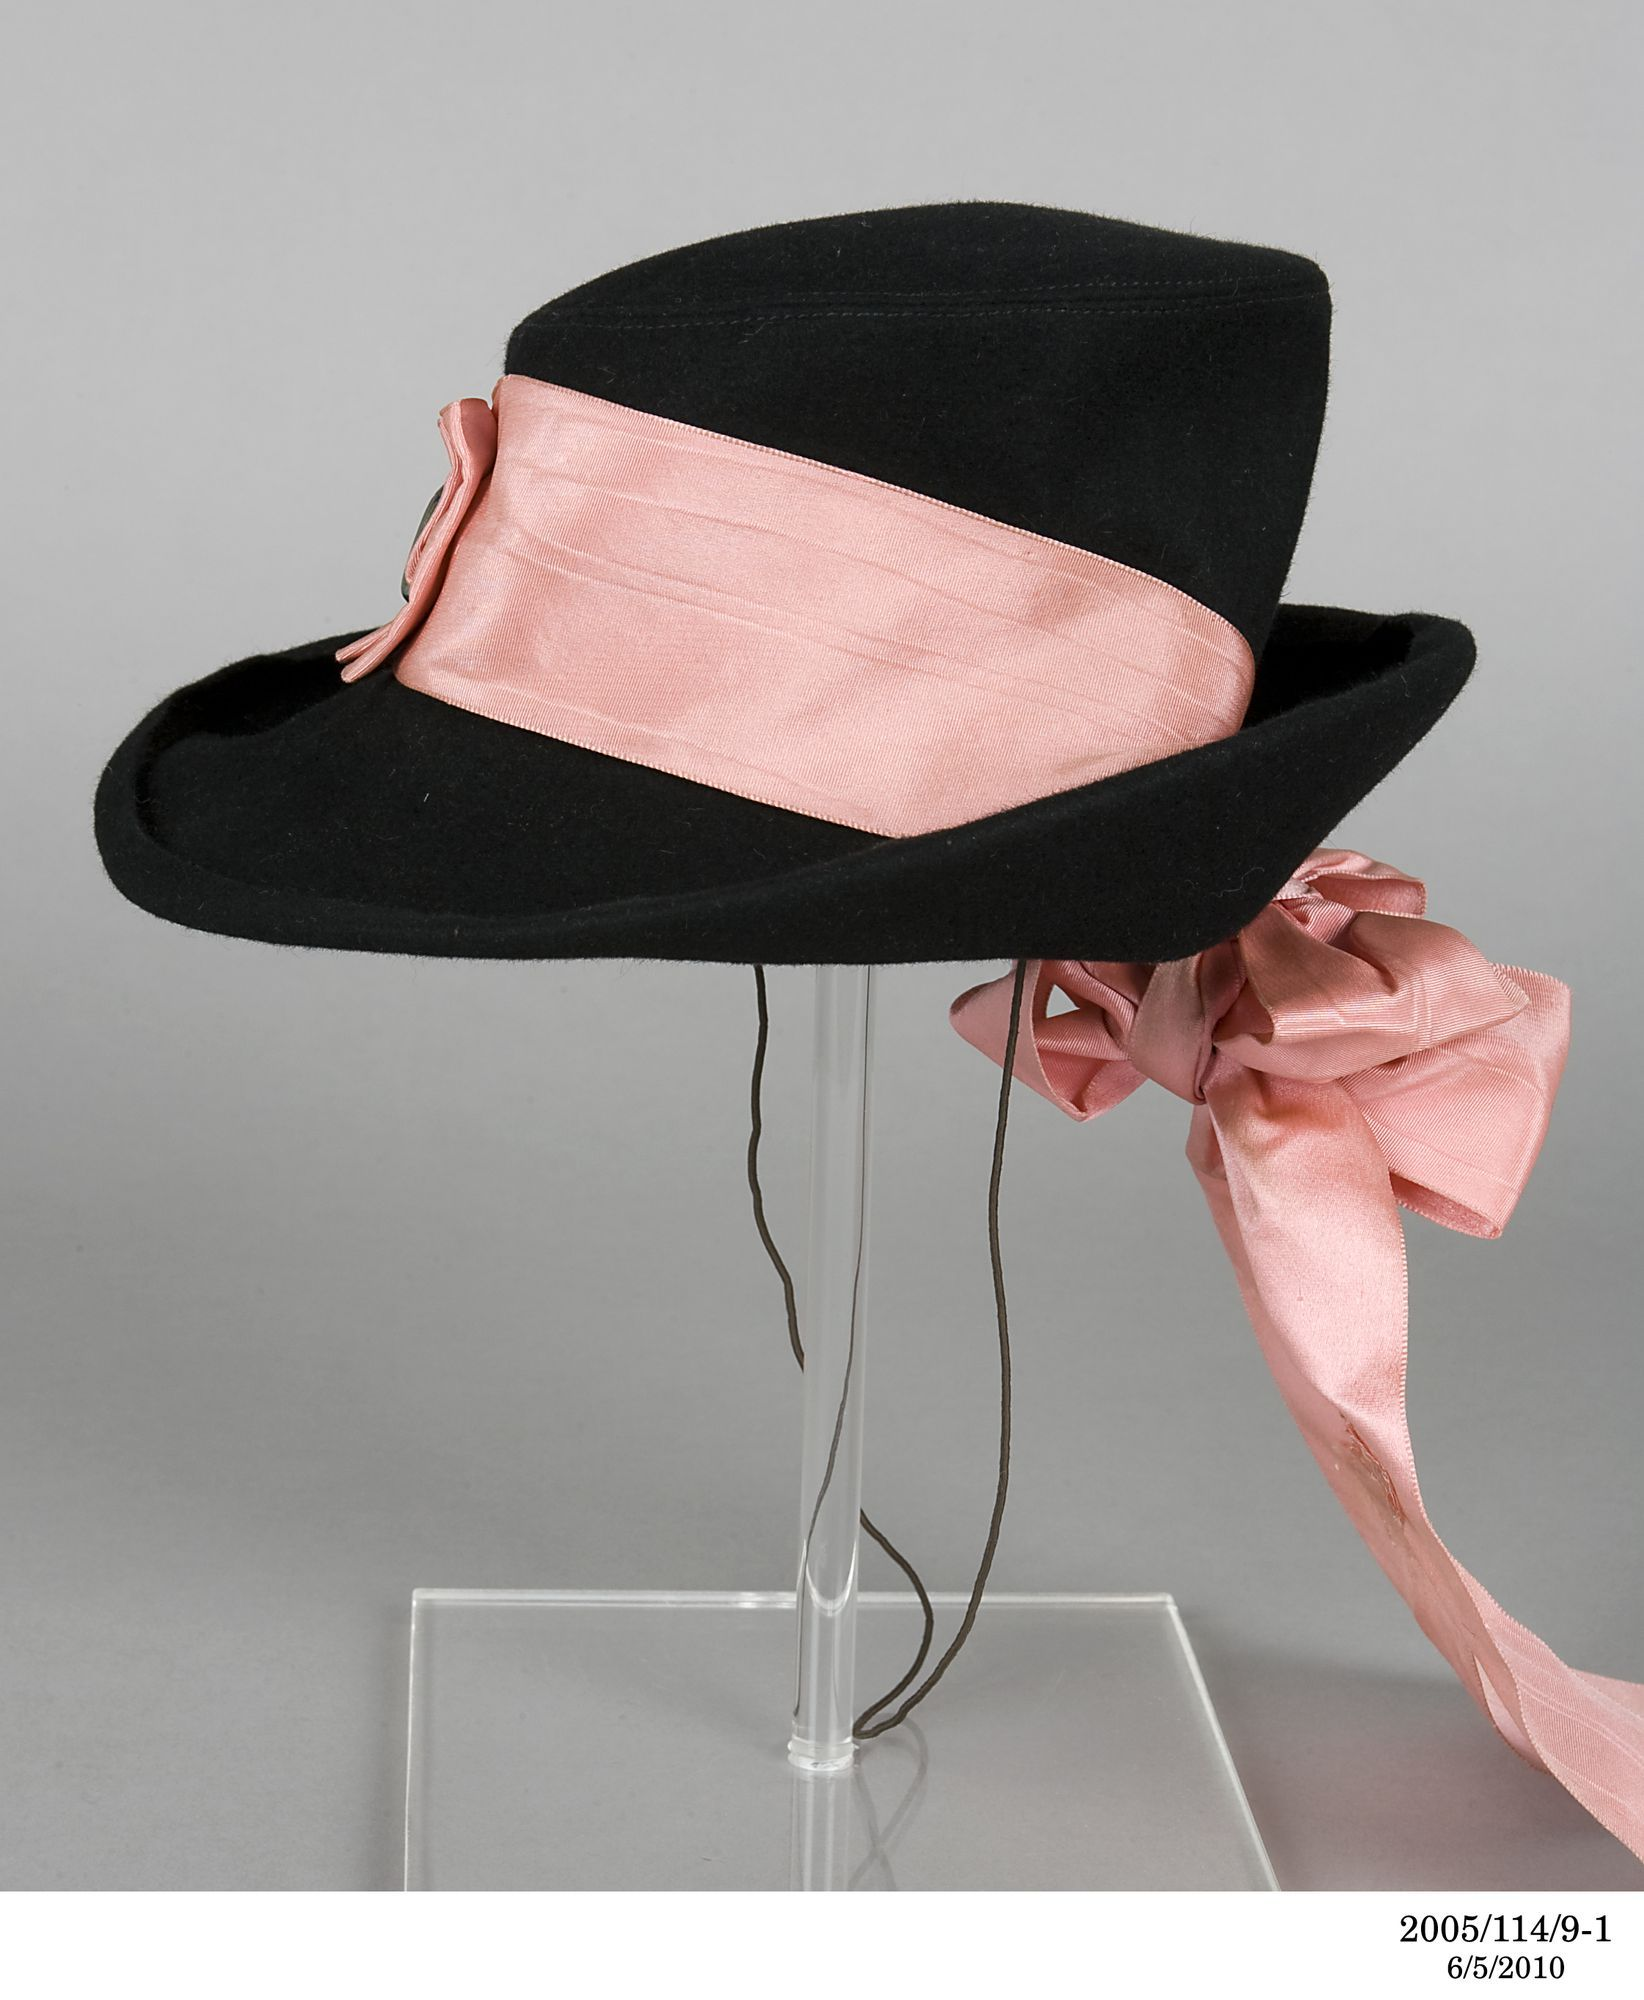 Hat Womans Felt Plastic Worn By Heather Waddell Of Moray Millinery Sydney New South Wales Australia Designed By Elegant Hats Hats Elsa Schiaparelli